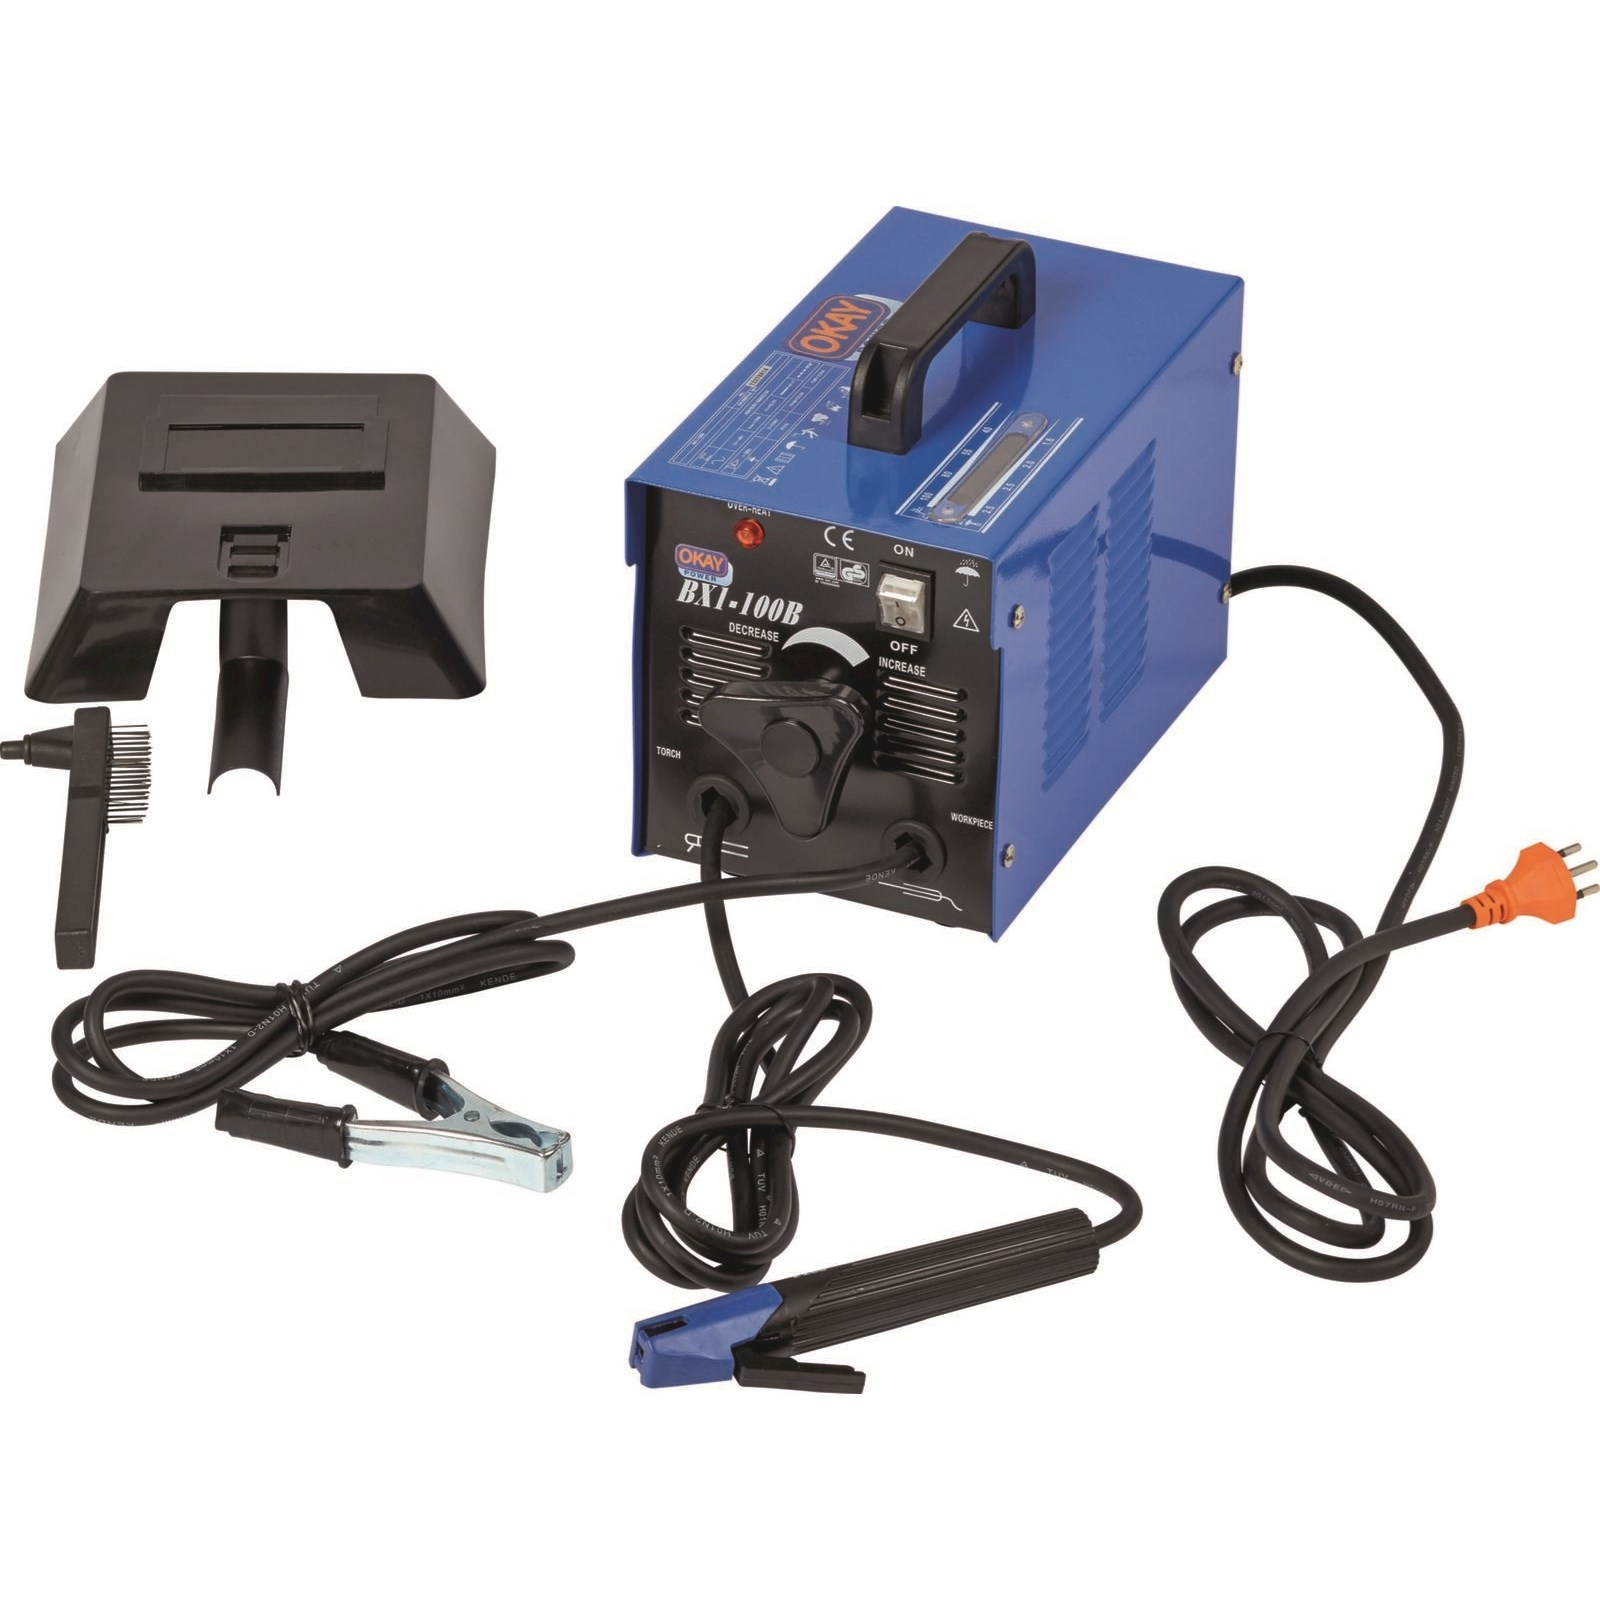 schweissgerät elektro okay power - schweissgeräte - landi